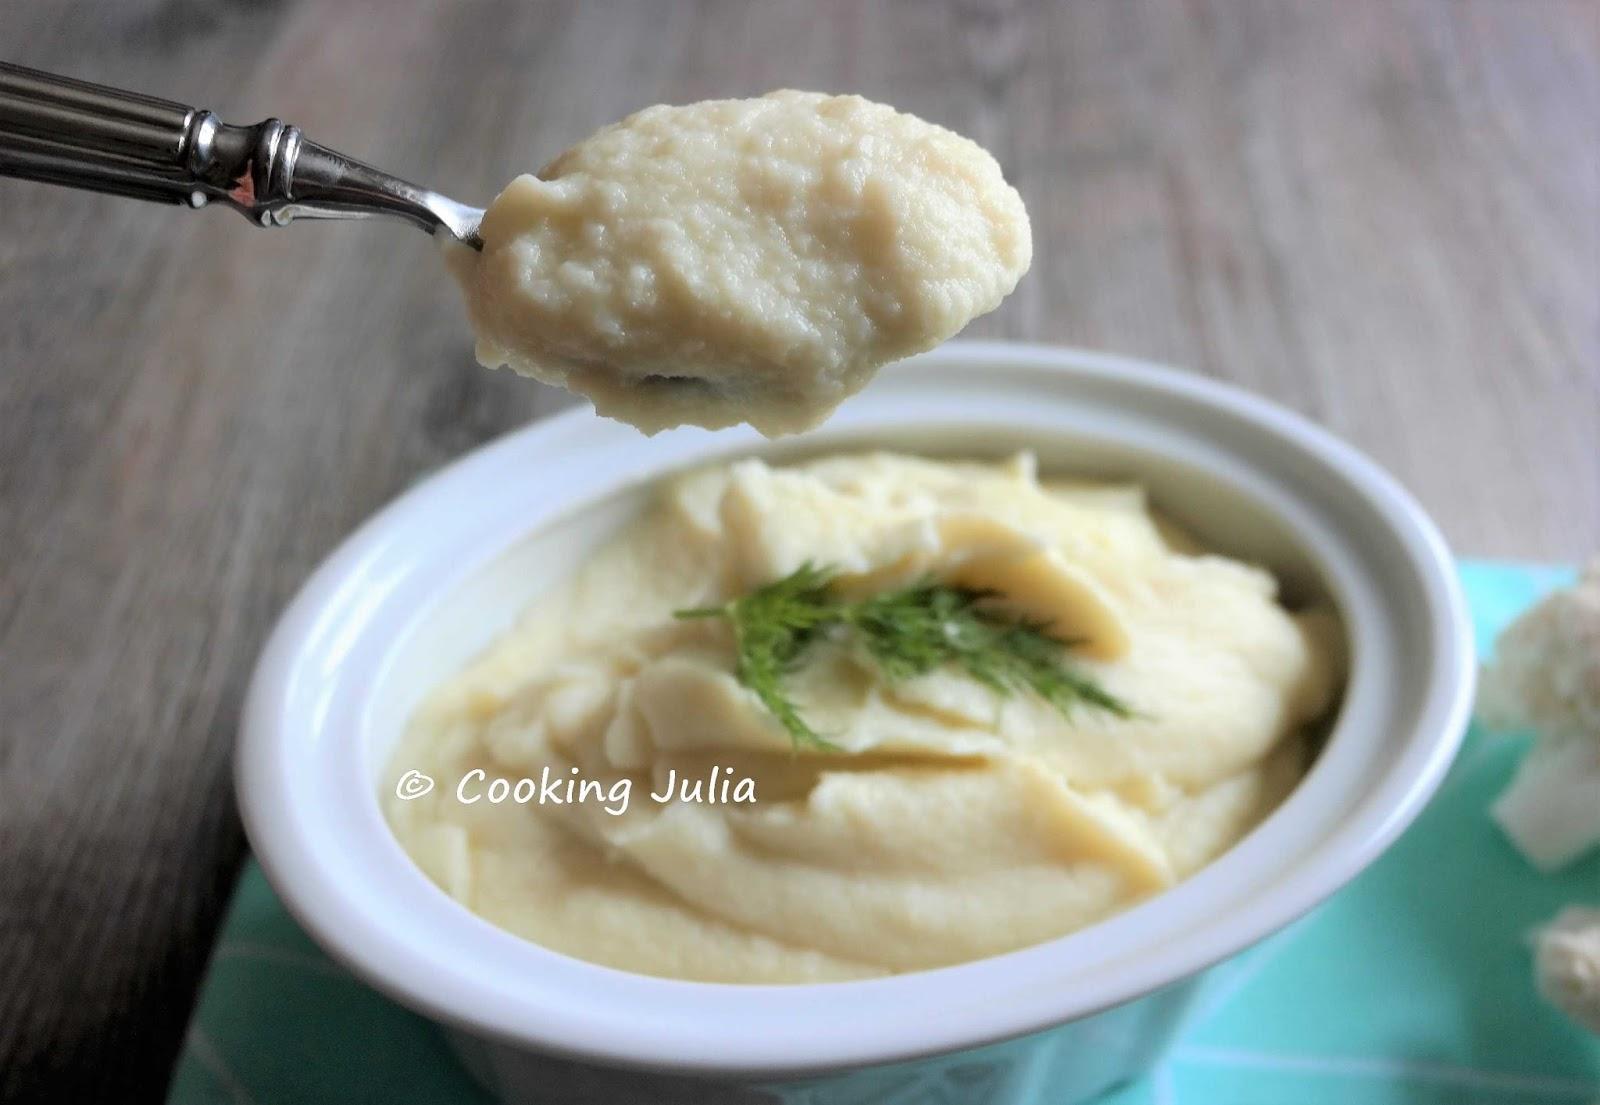 Cooking Julia Puree De Chou Fleur